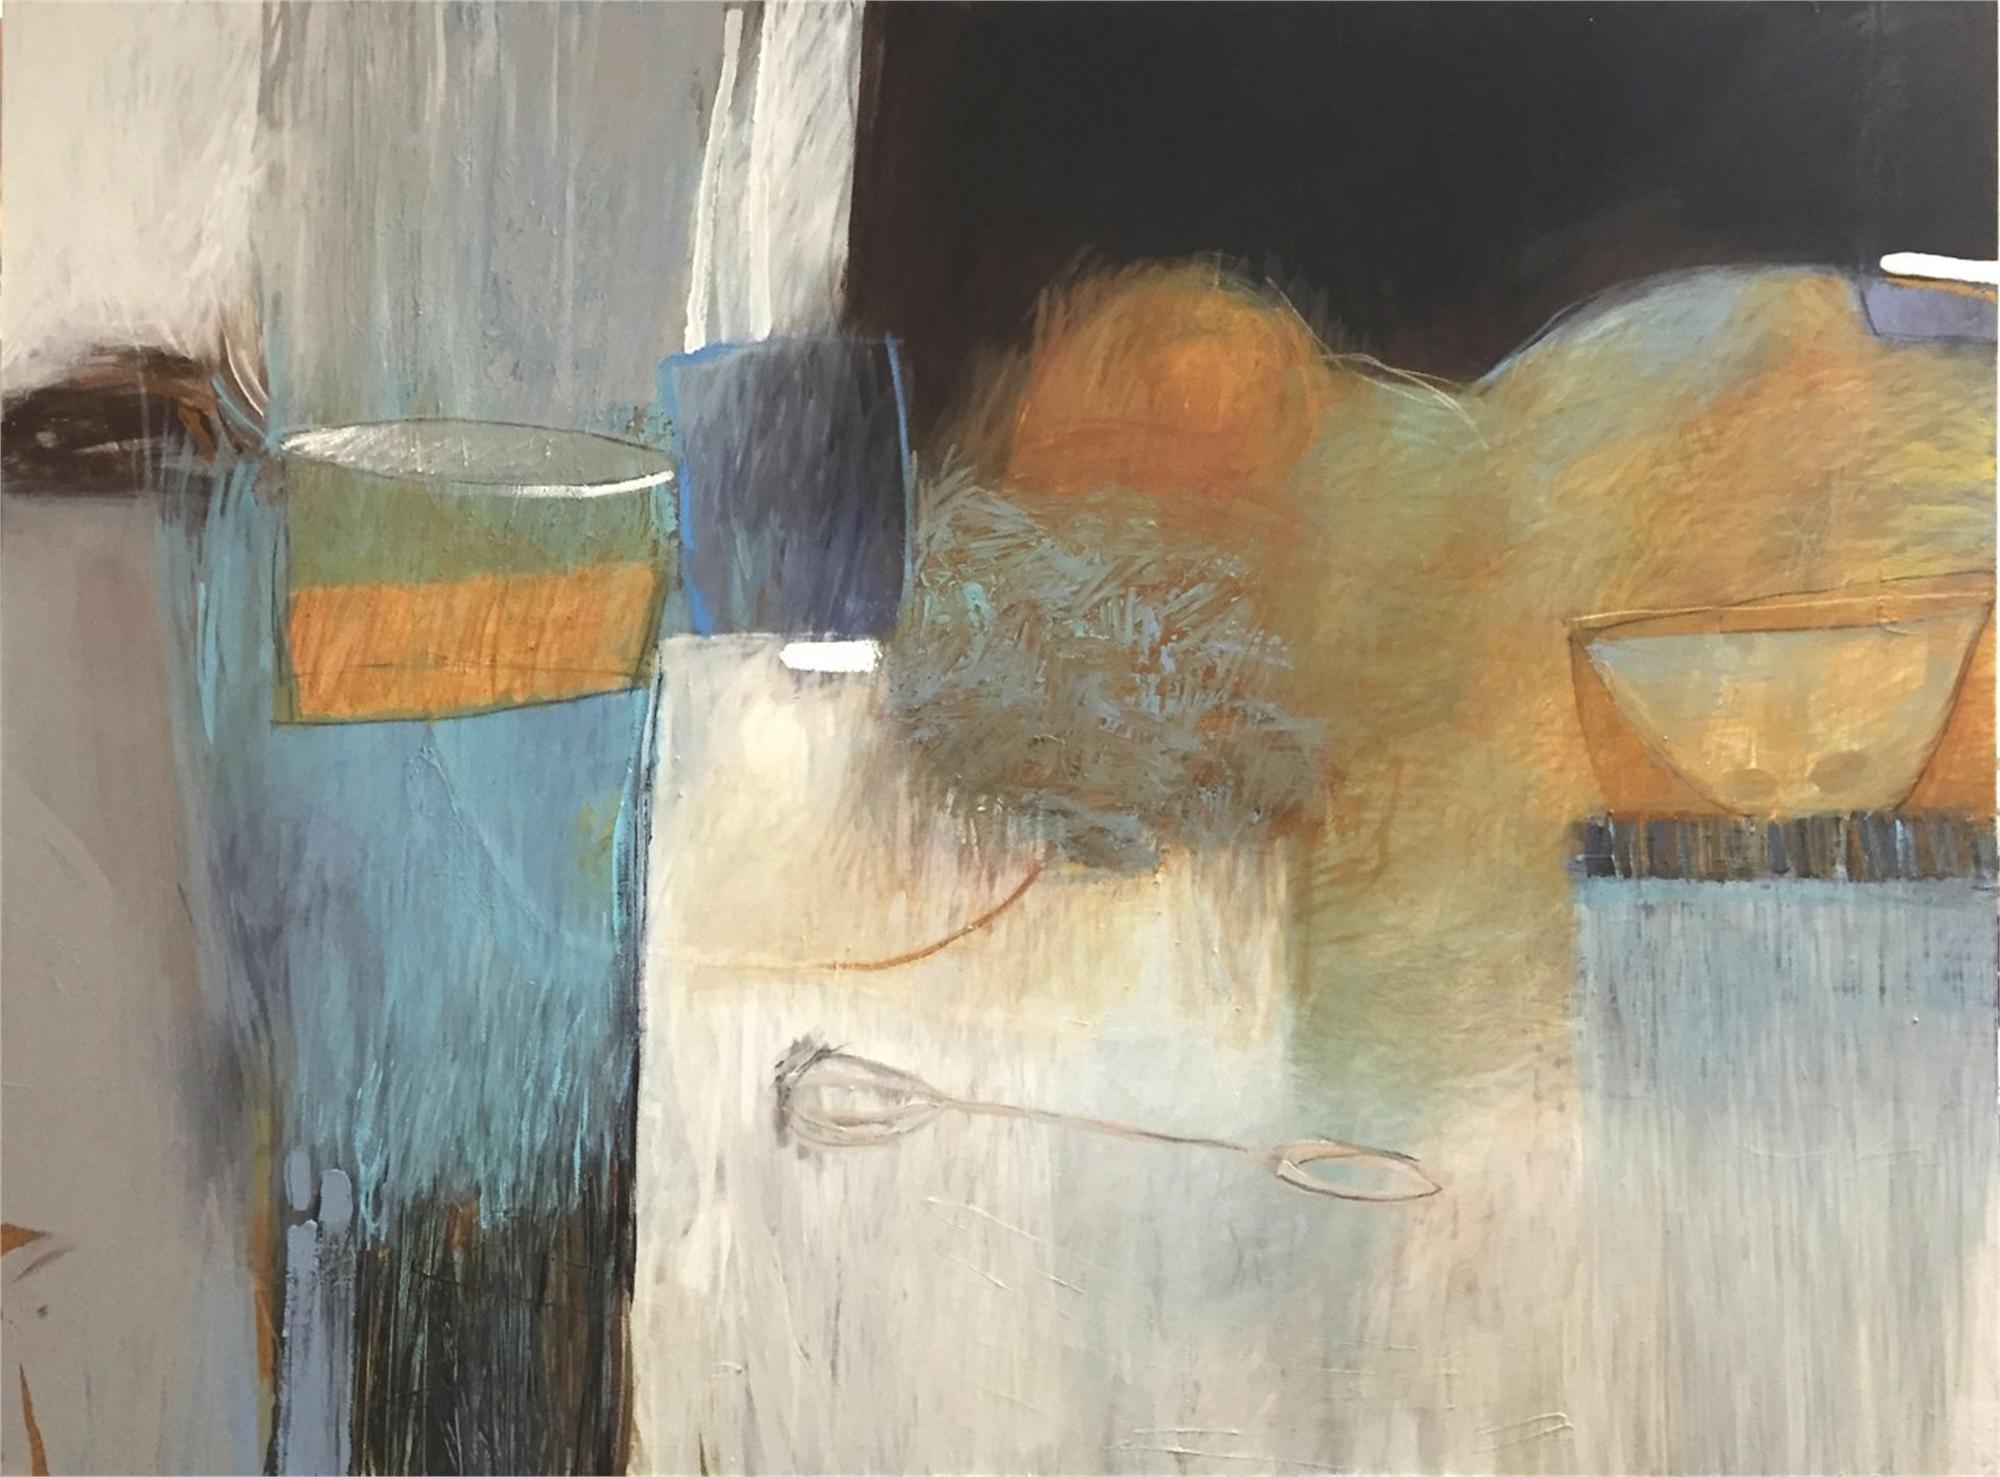 Untitled 162072 by Karen Roehl